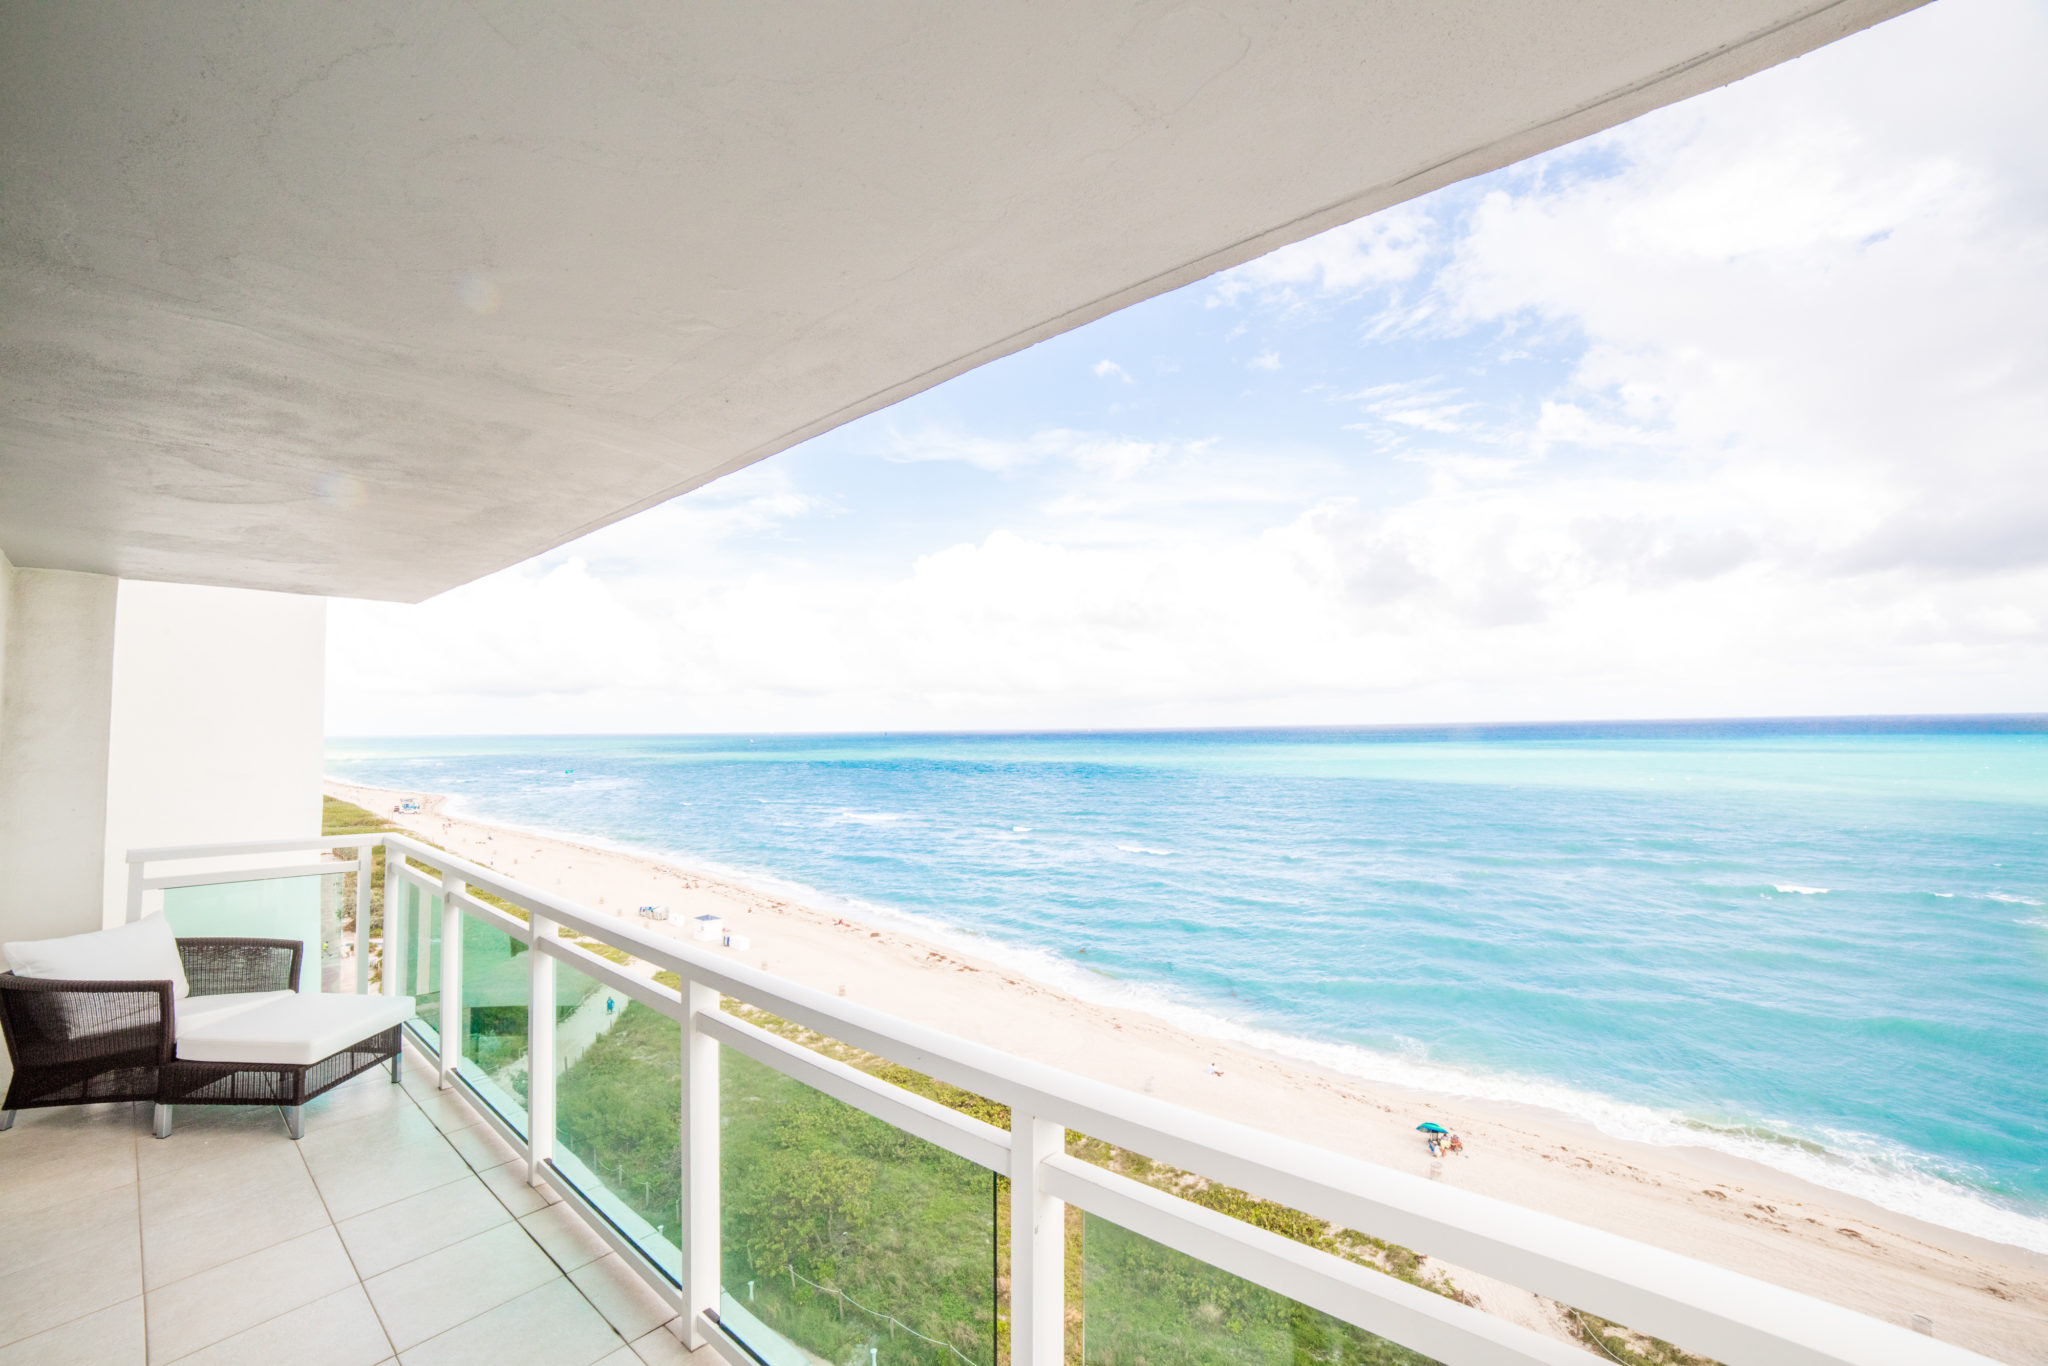 Appartement vue sur mer à Miami Beach à vendre